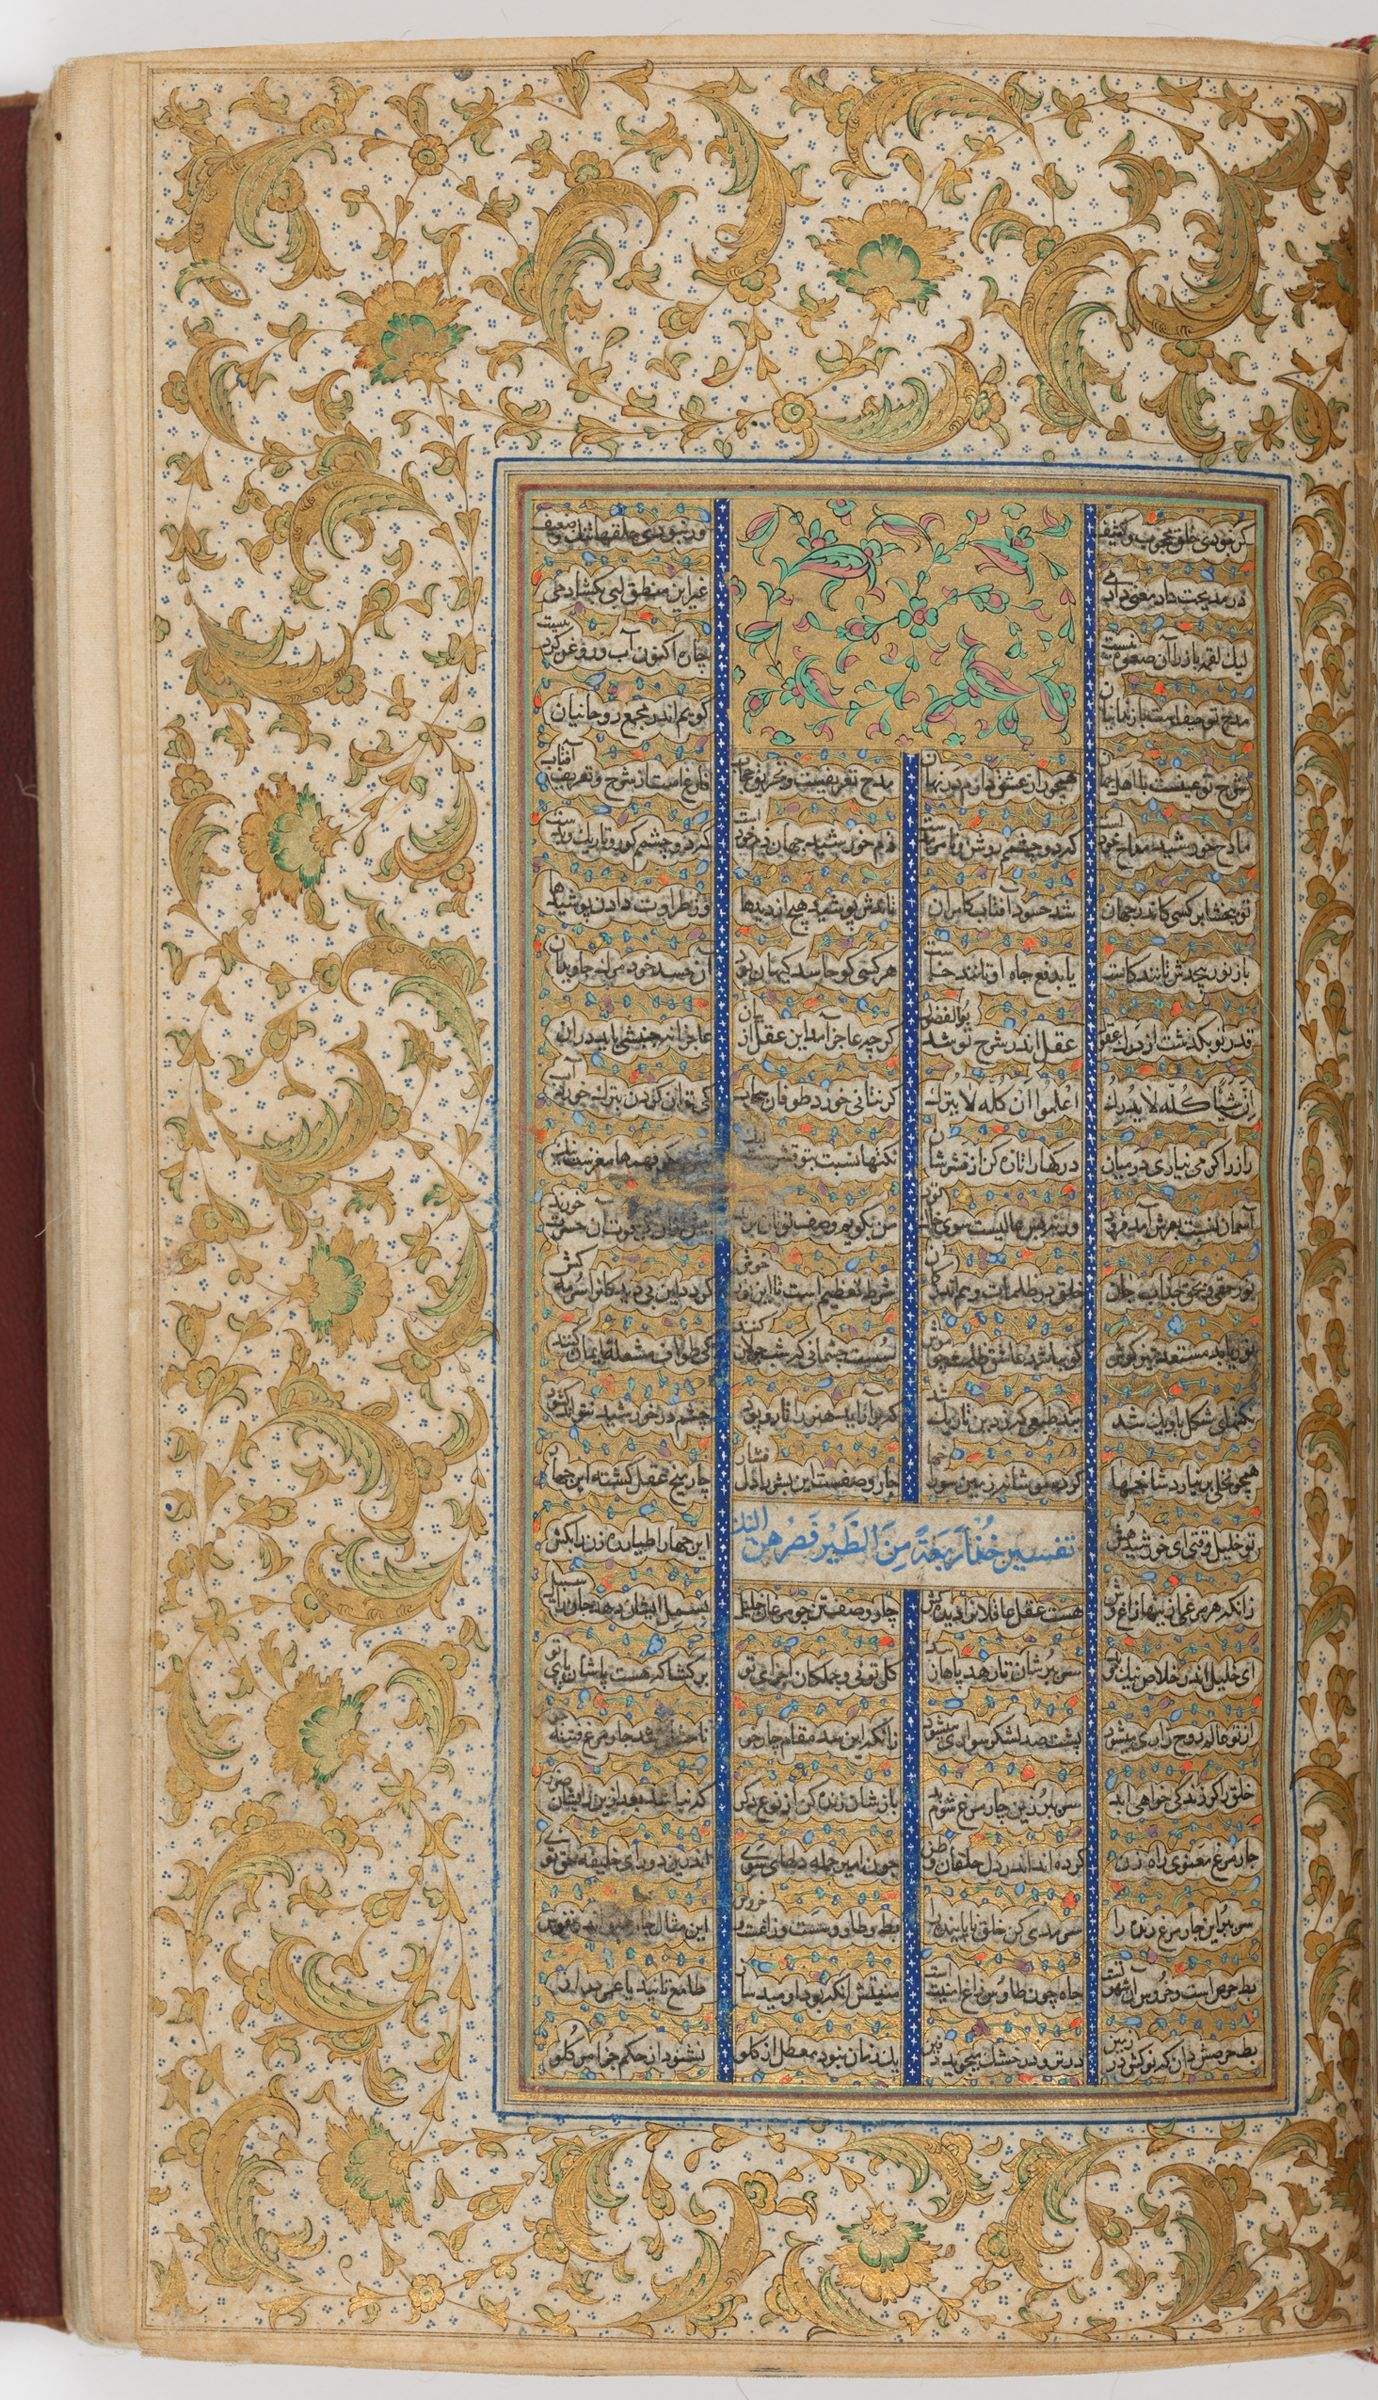 Illuminated Margin And Interlinear Gilt Text Folio (Illumination And Gilt Recto; Text Verso Of Folio 190), From A Manuscript Of The Mathnavi Ma'navi By Maulana Jalal Al-Din Rum